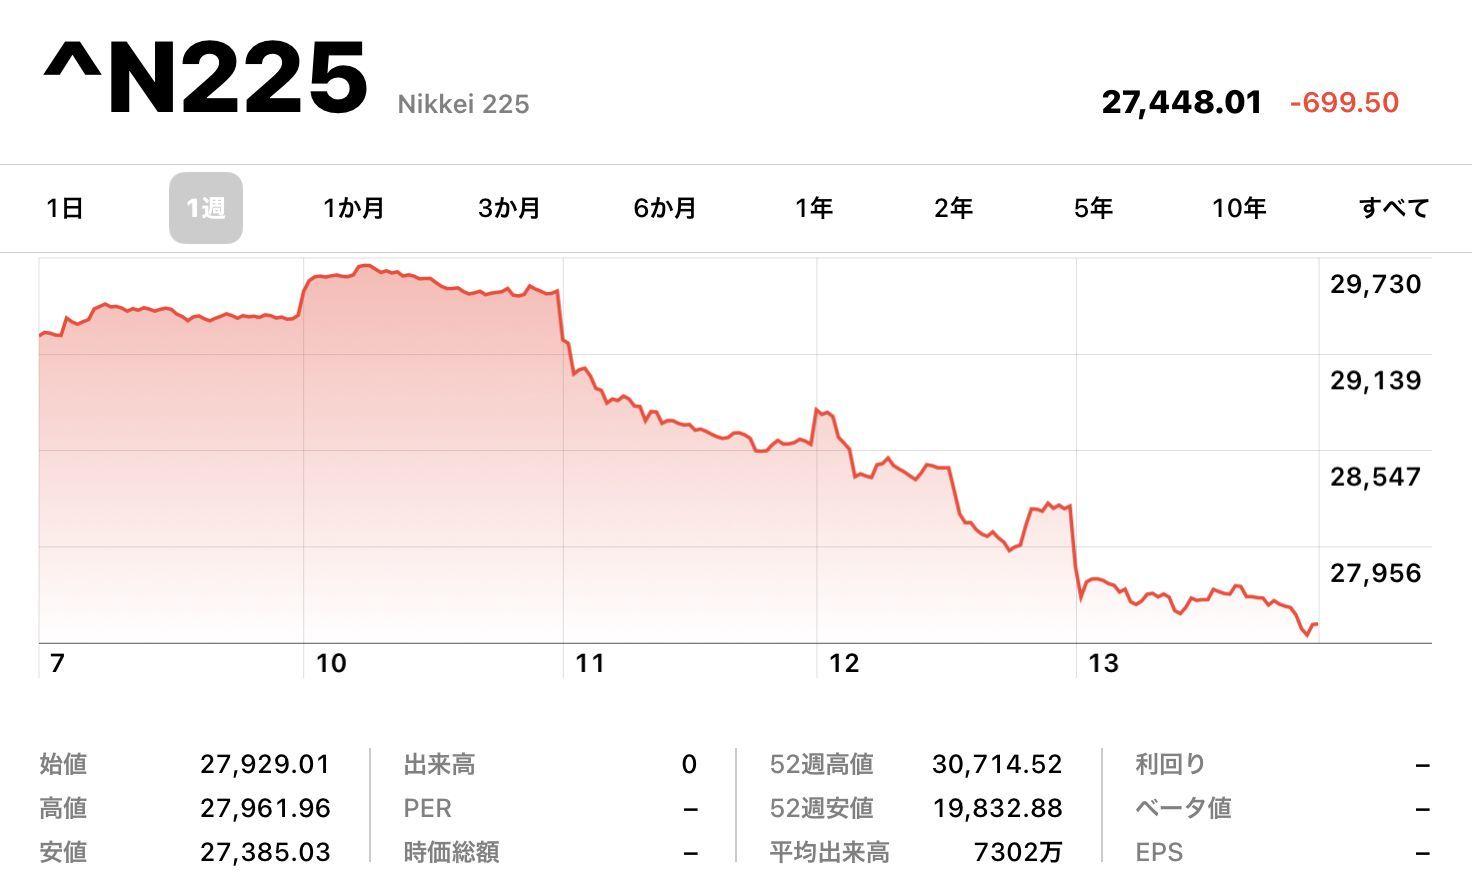 株価は続落、札幌・北海道の新規感染者は歴史的増加_c0025115_22294621.jpg